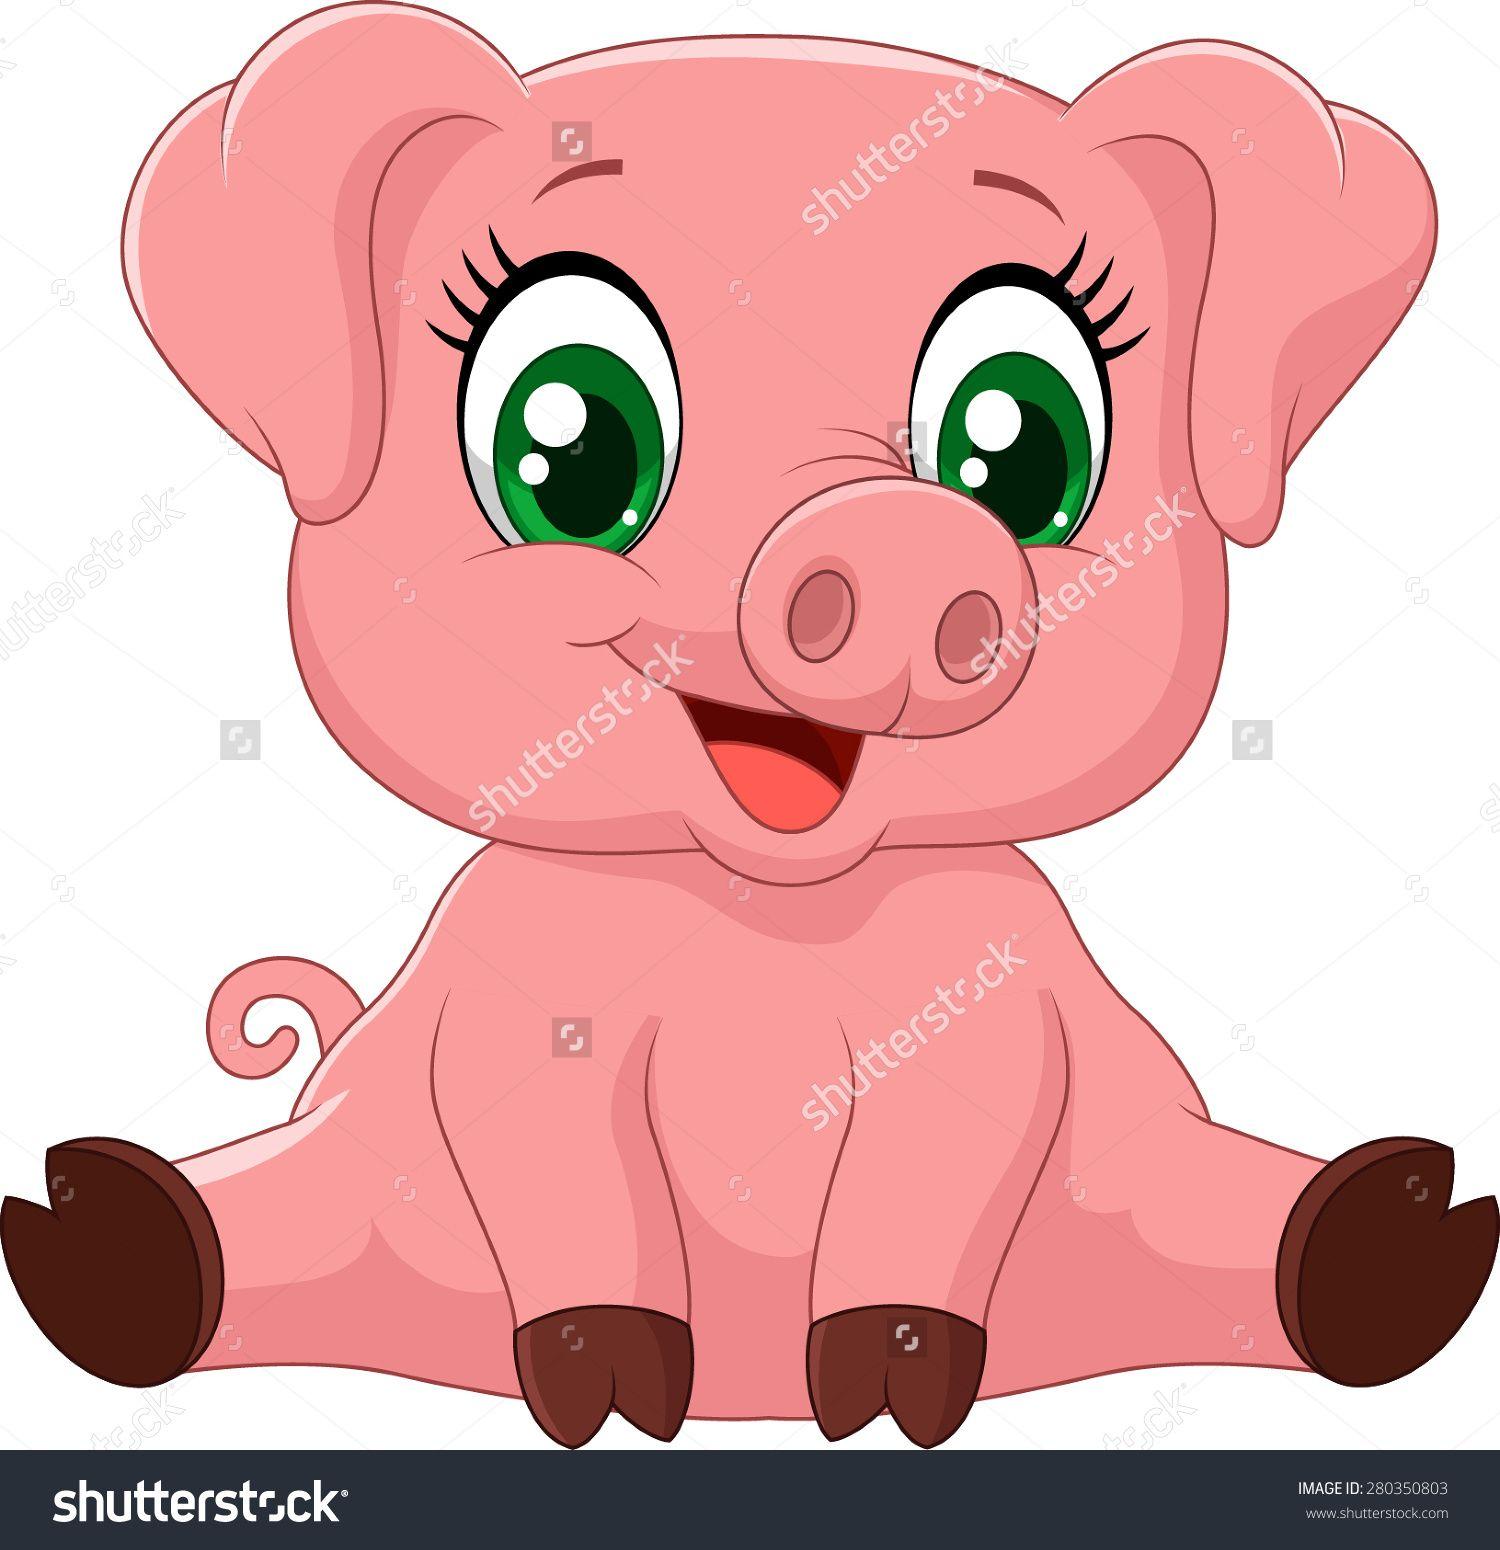 stock-vector-cartoon-adorable-baby-pig-illustration-280350803.jpg ...